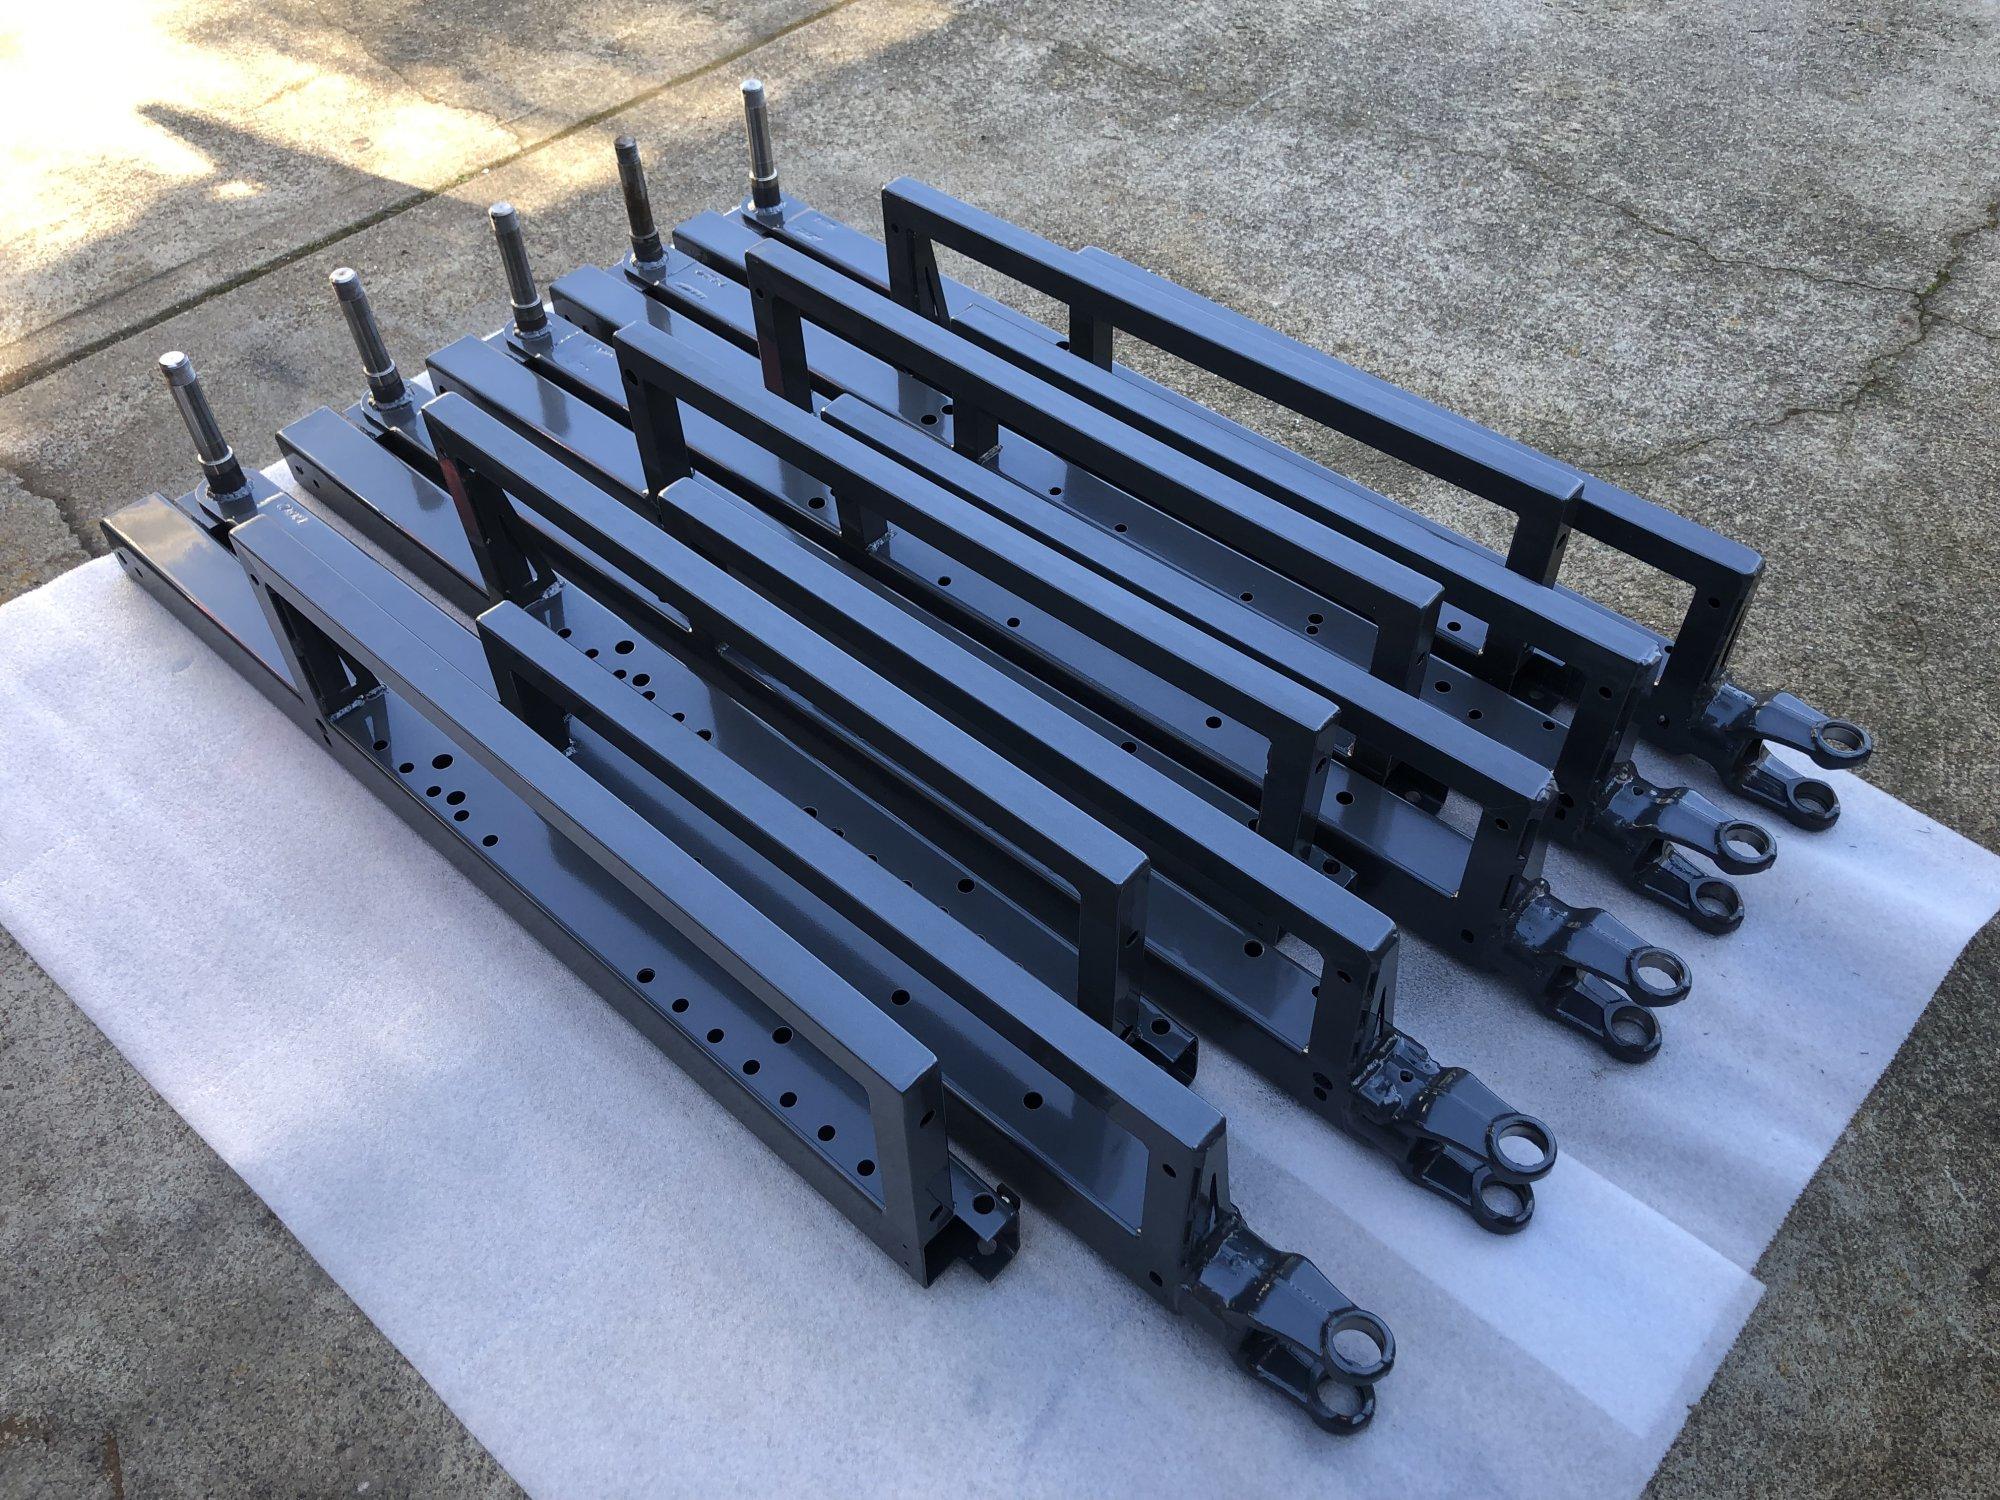 2E8CCA6B-0BCC-44D1-8C6D-52B5C90563B6.jpeg